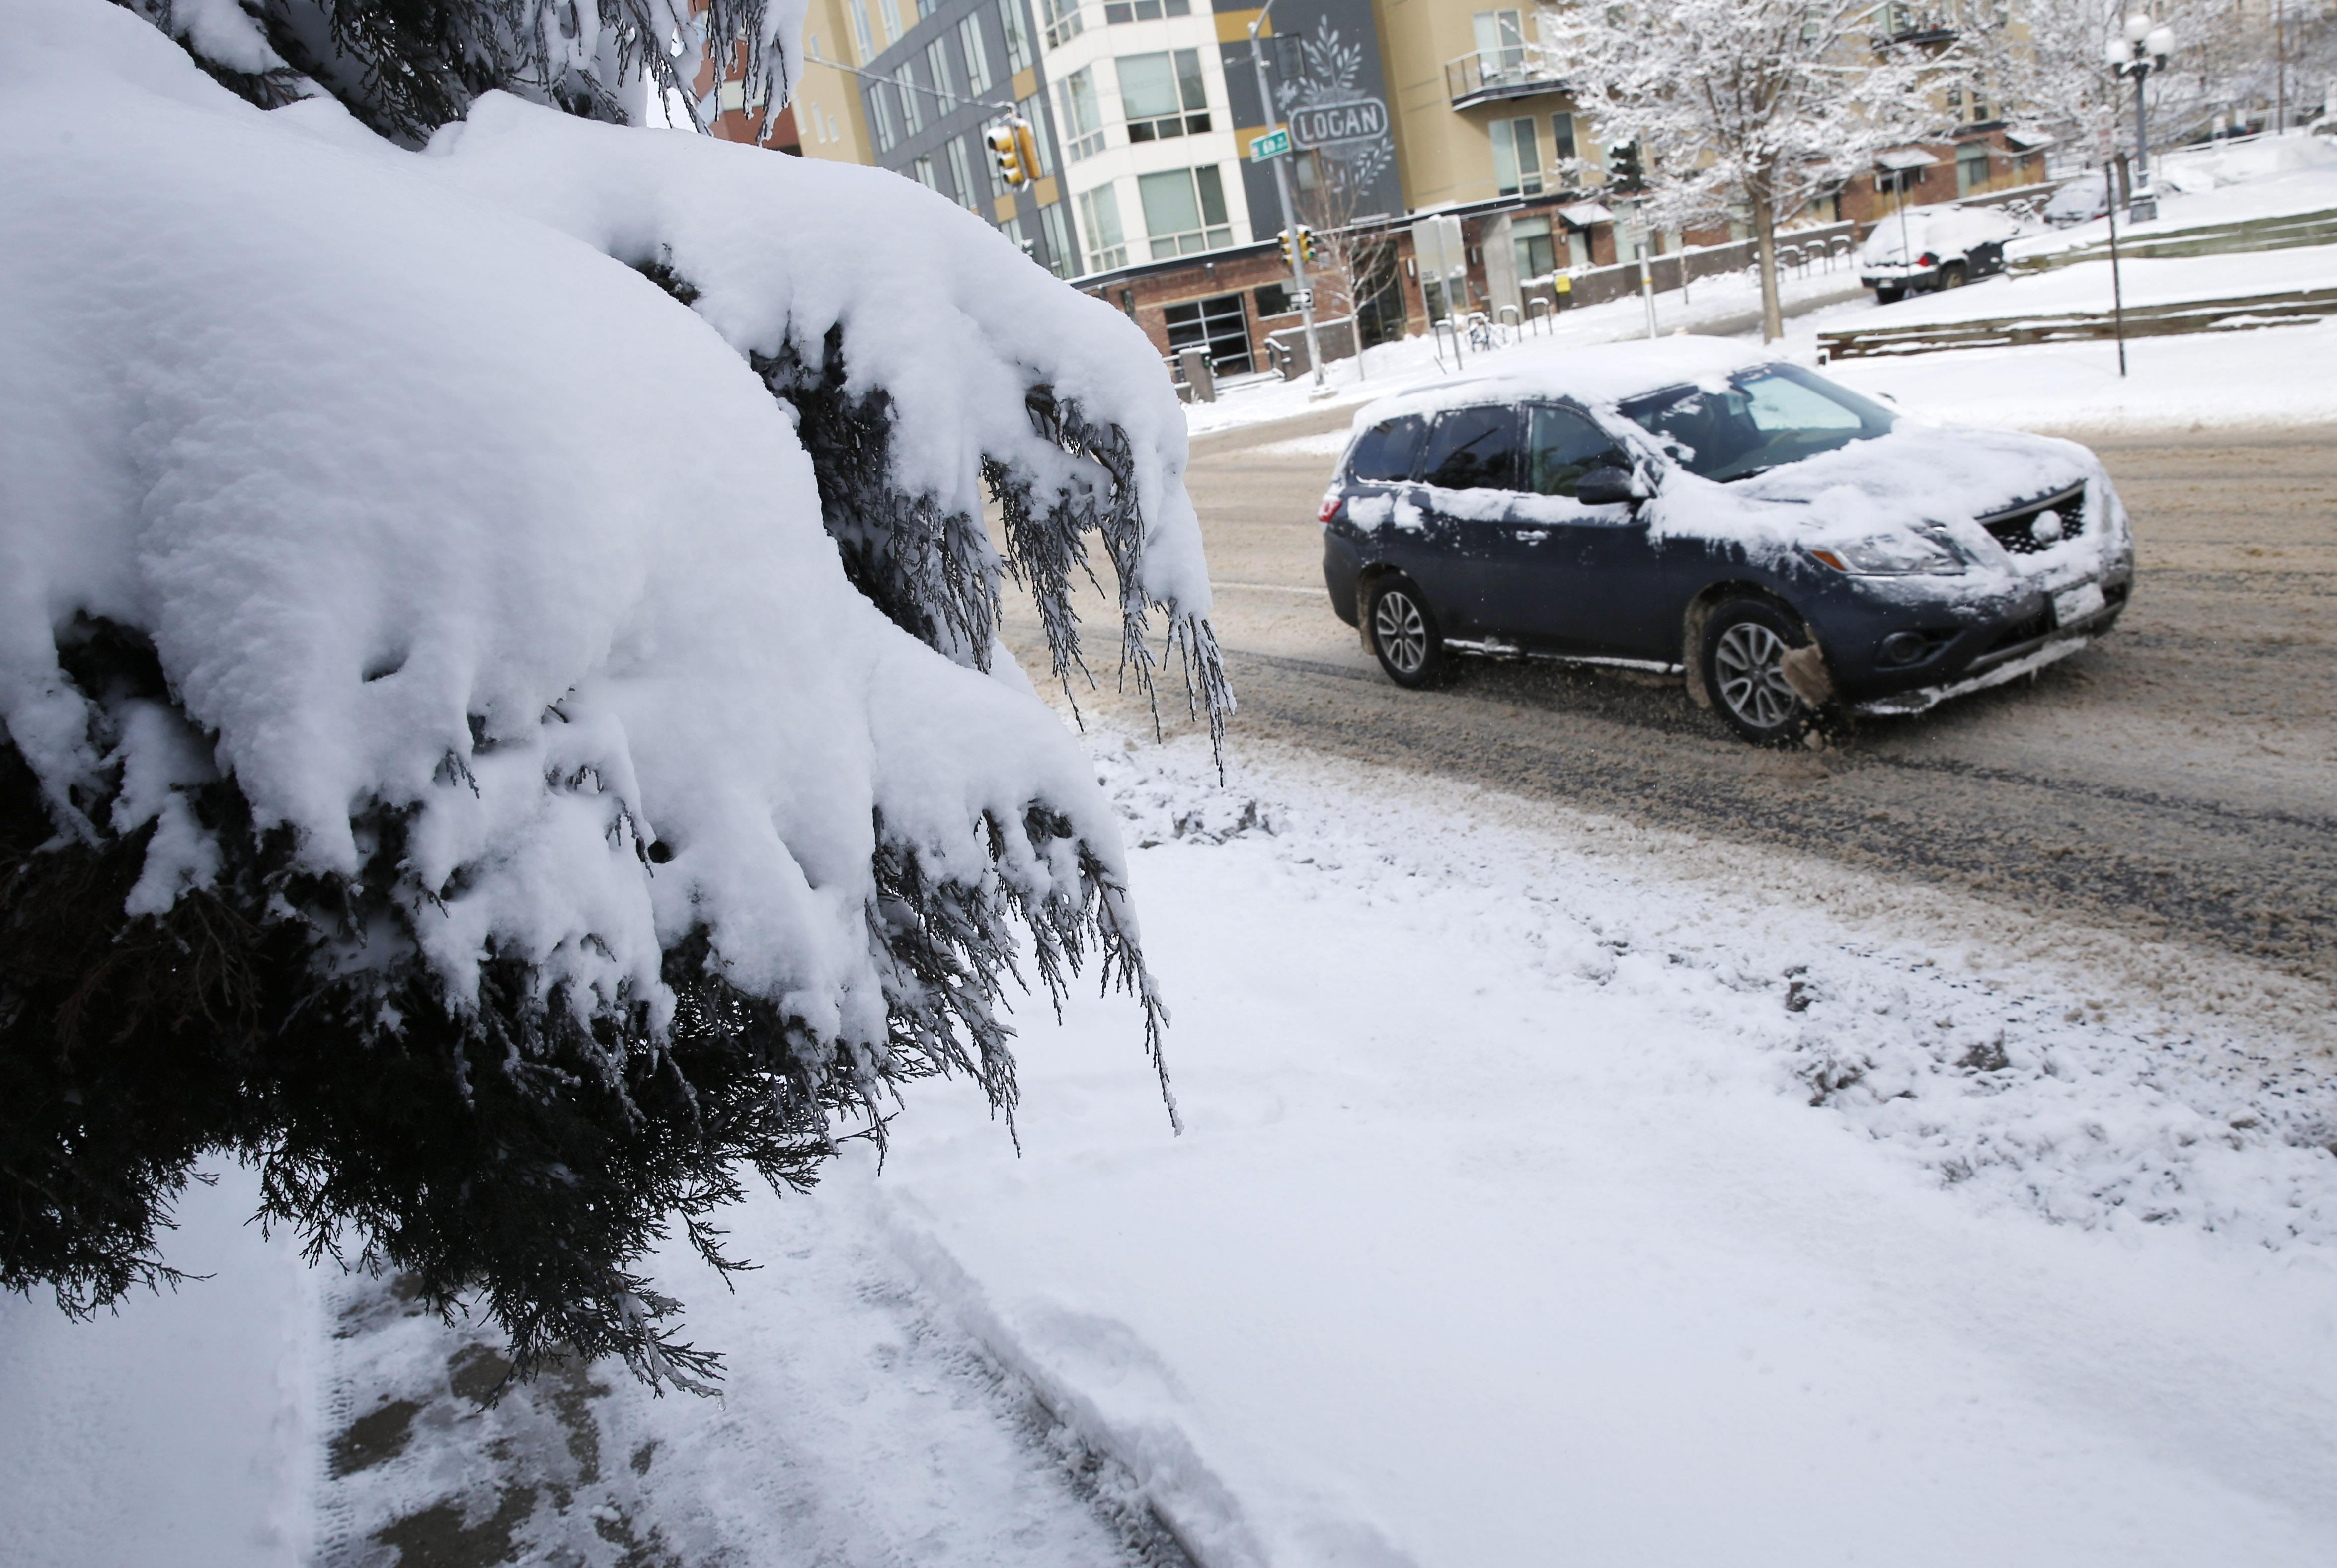 4-wheel drive is not foolproof in snow